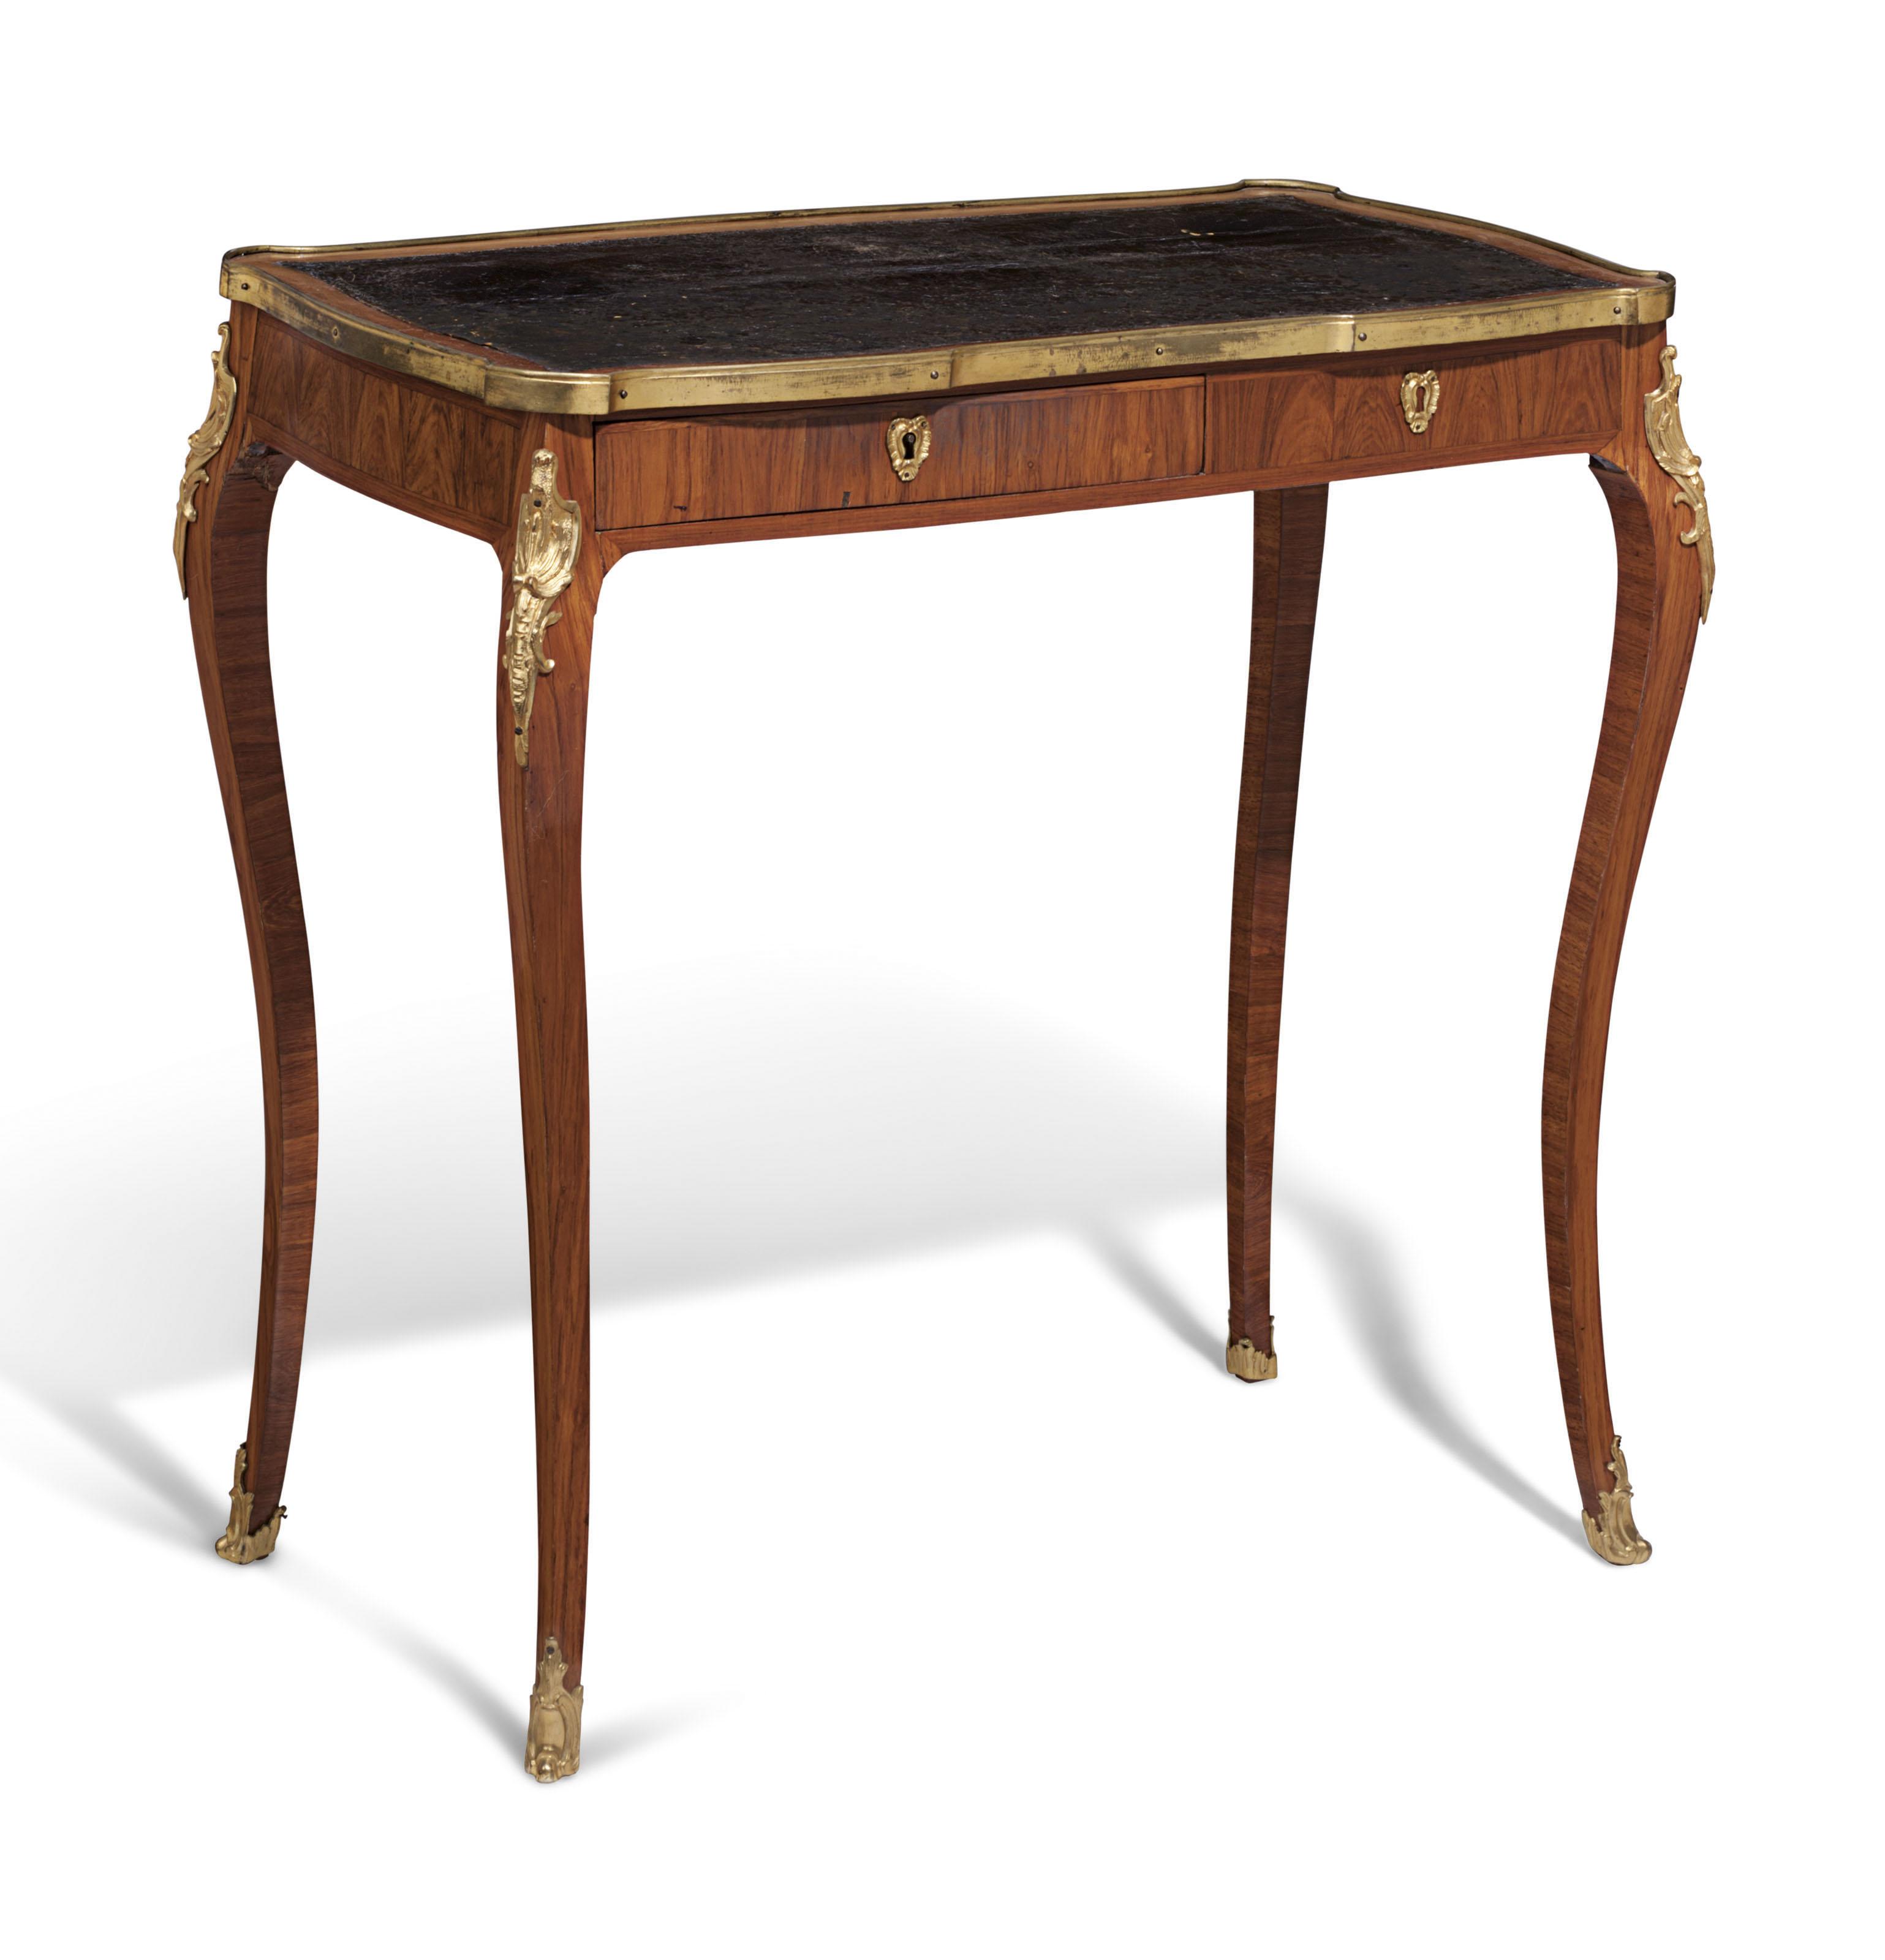 A LATE LOUIS XV ORMOLU-MOUNTED TULIPWOOD TABLE A ECRIRE